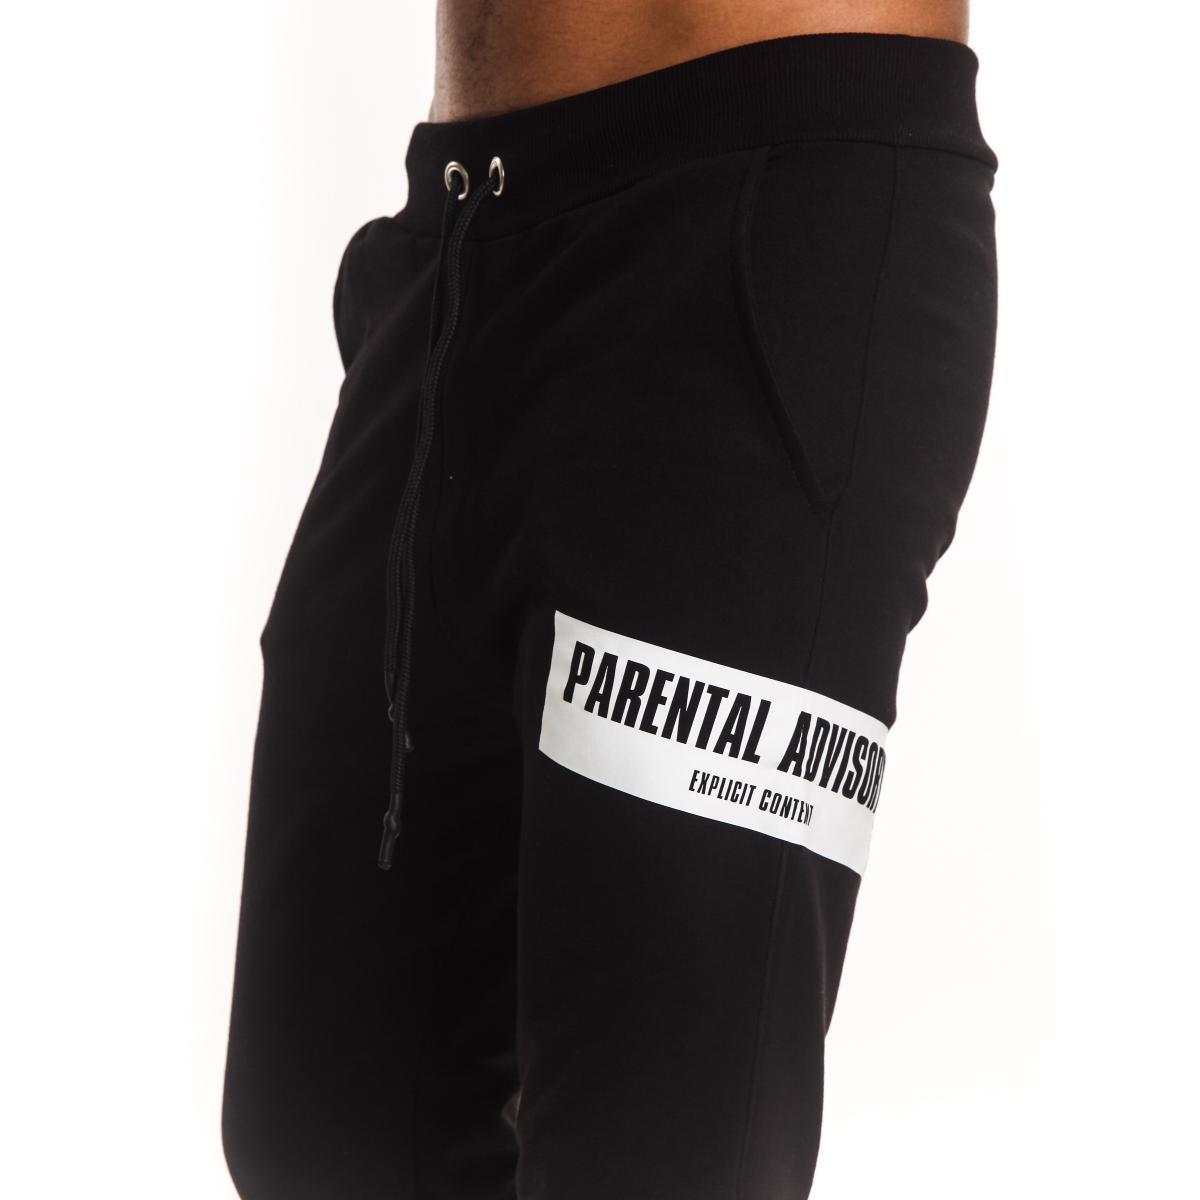 Pantalone tuta Parental Advisory con stampa ed elestici al fondo da uomo rif. AD952U